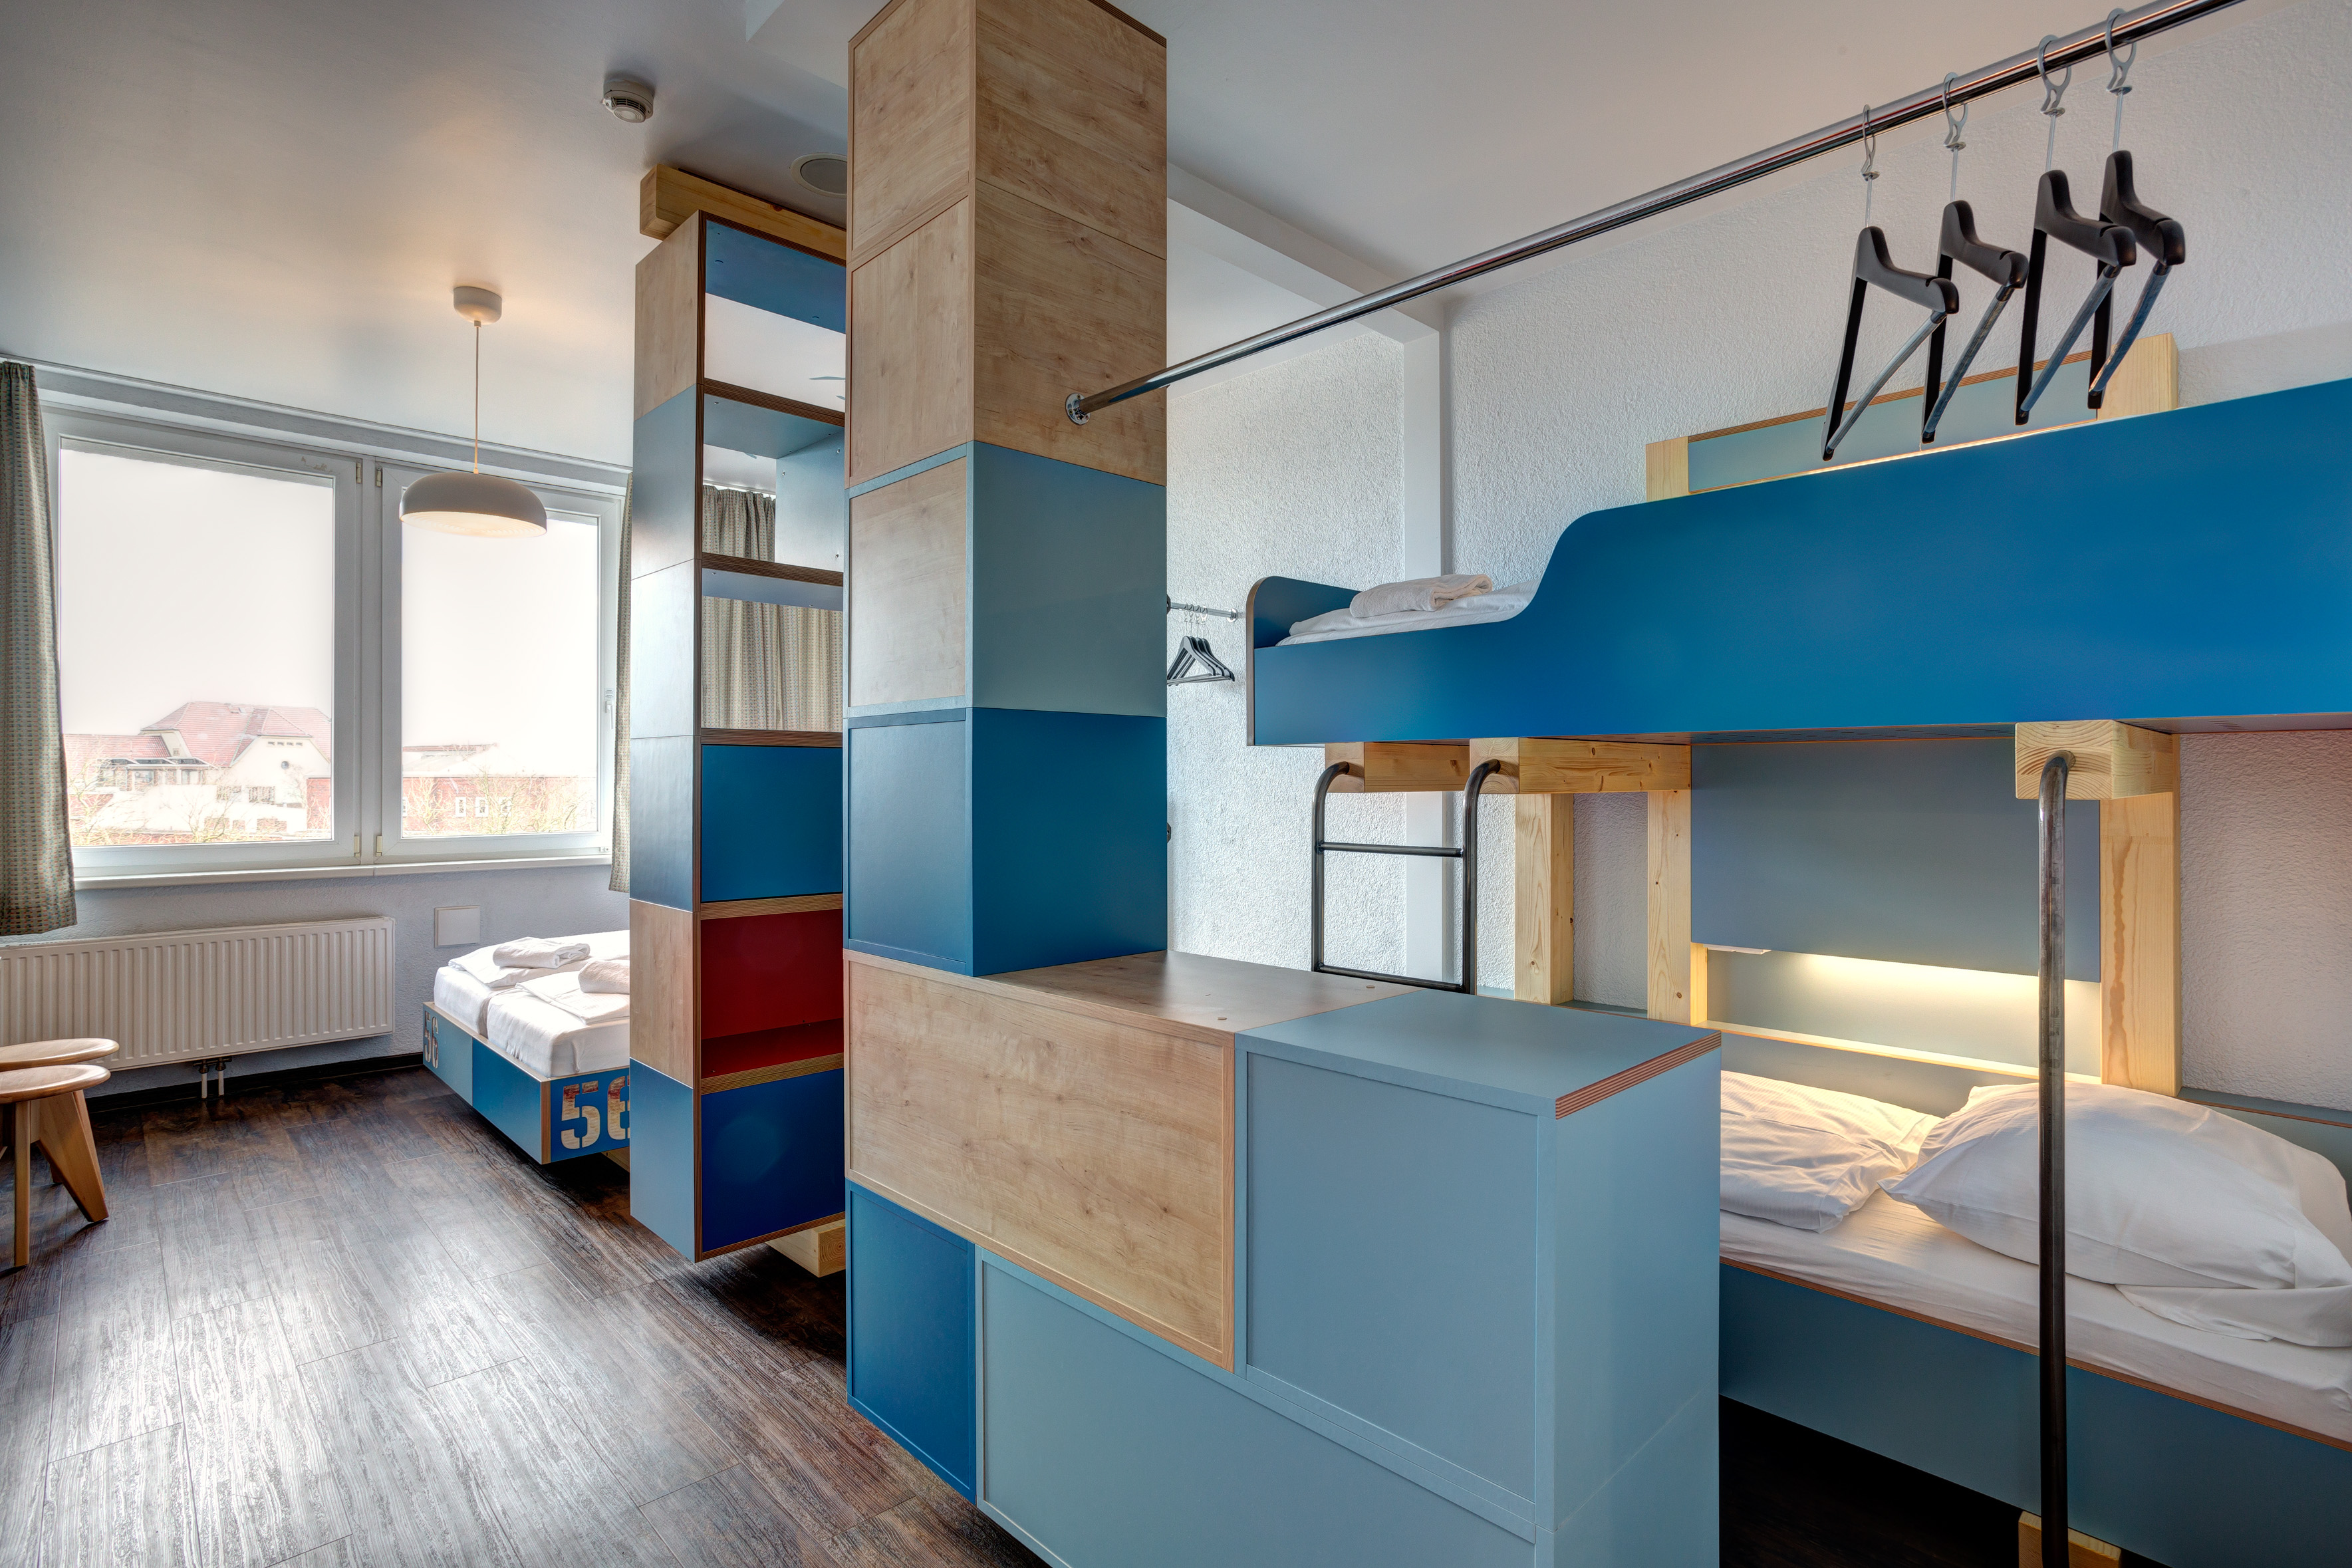 meininger hotel hamburg city center g nstig modern zentral